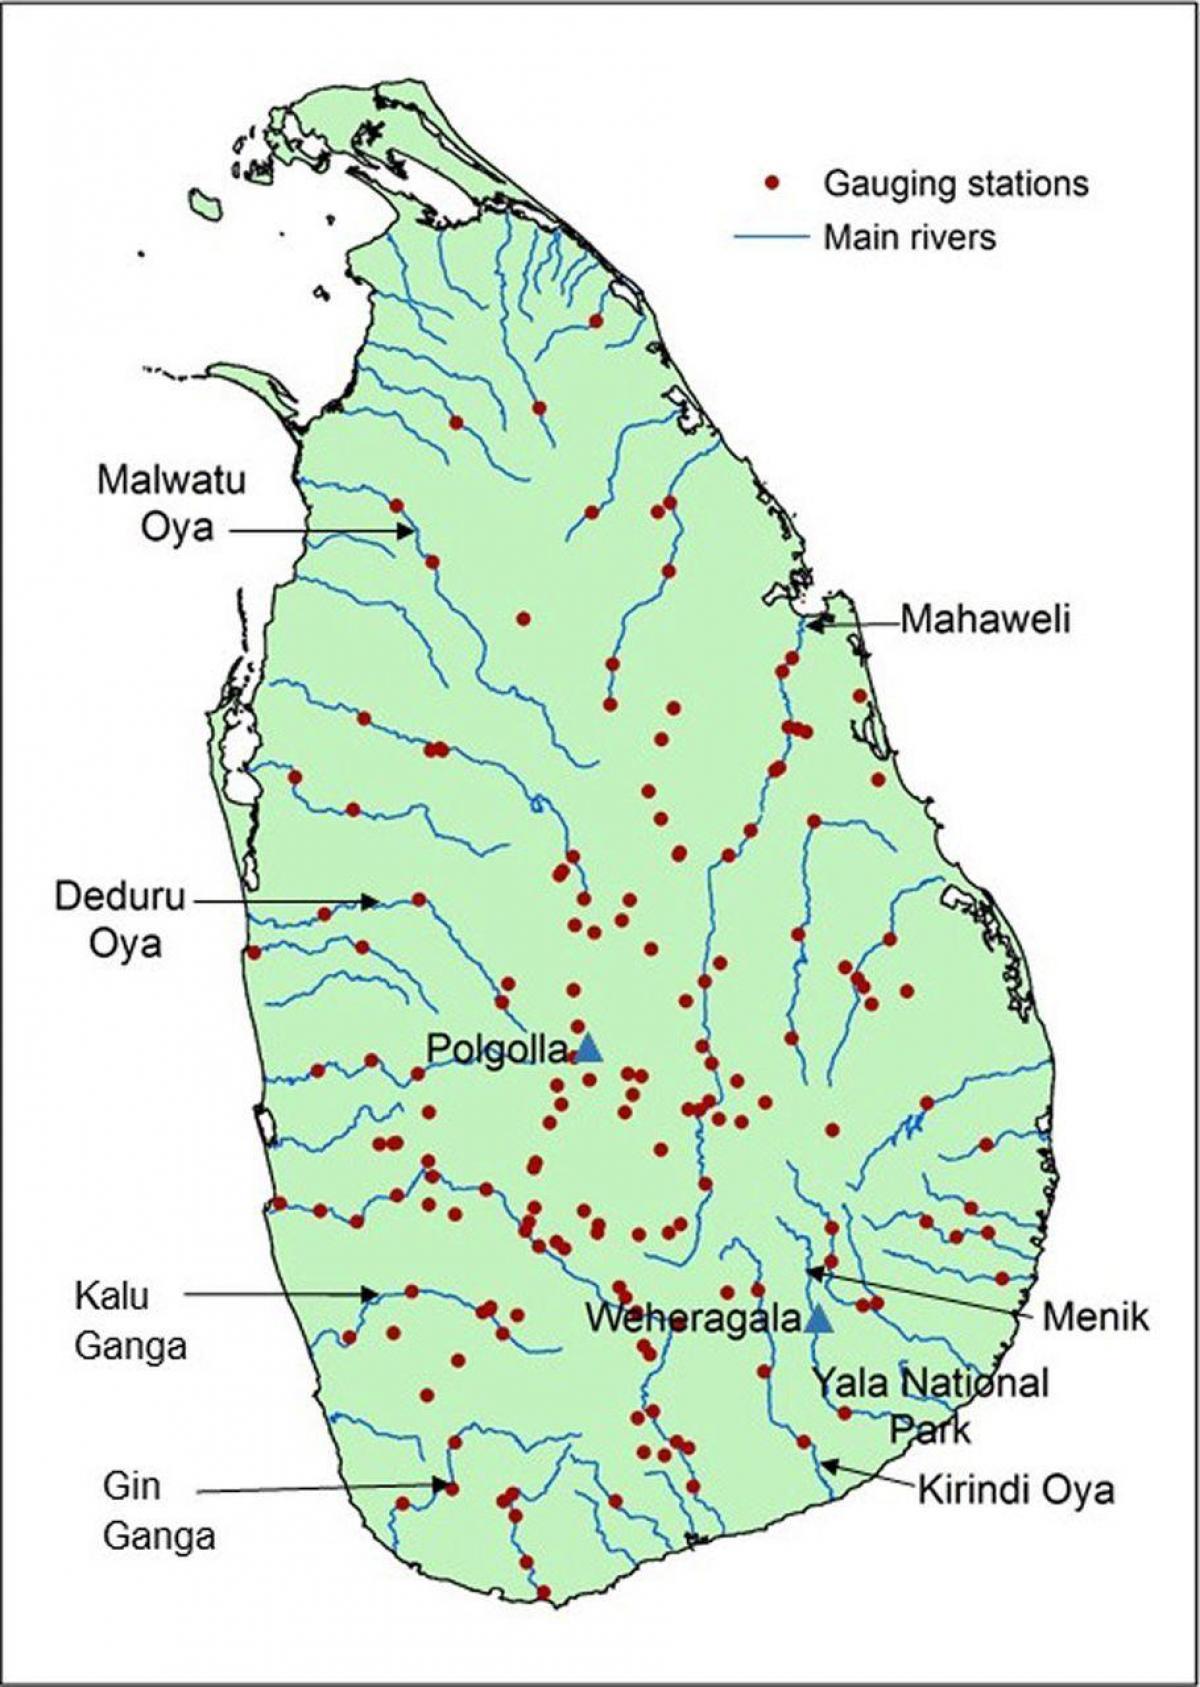 Sri Lanka river map - River map Sri Lanka (Southern Asia - Asia)